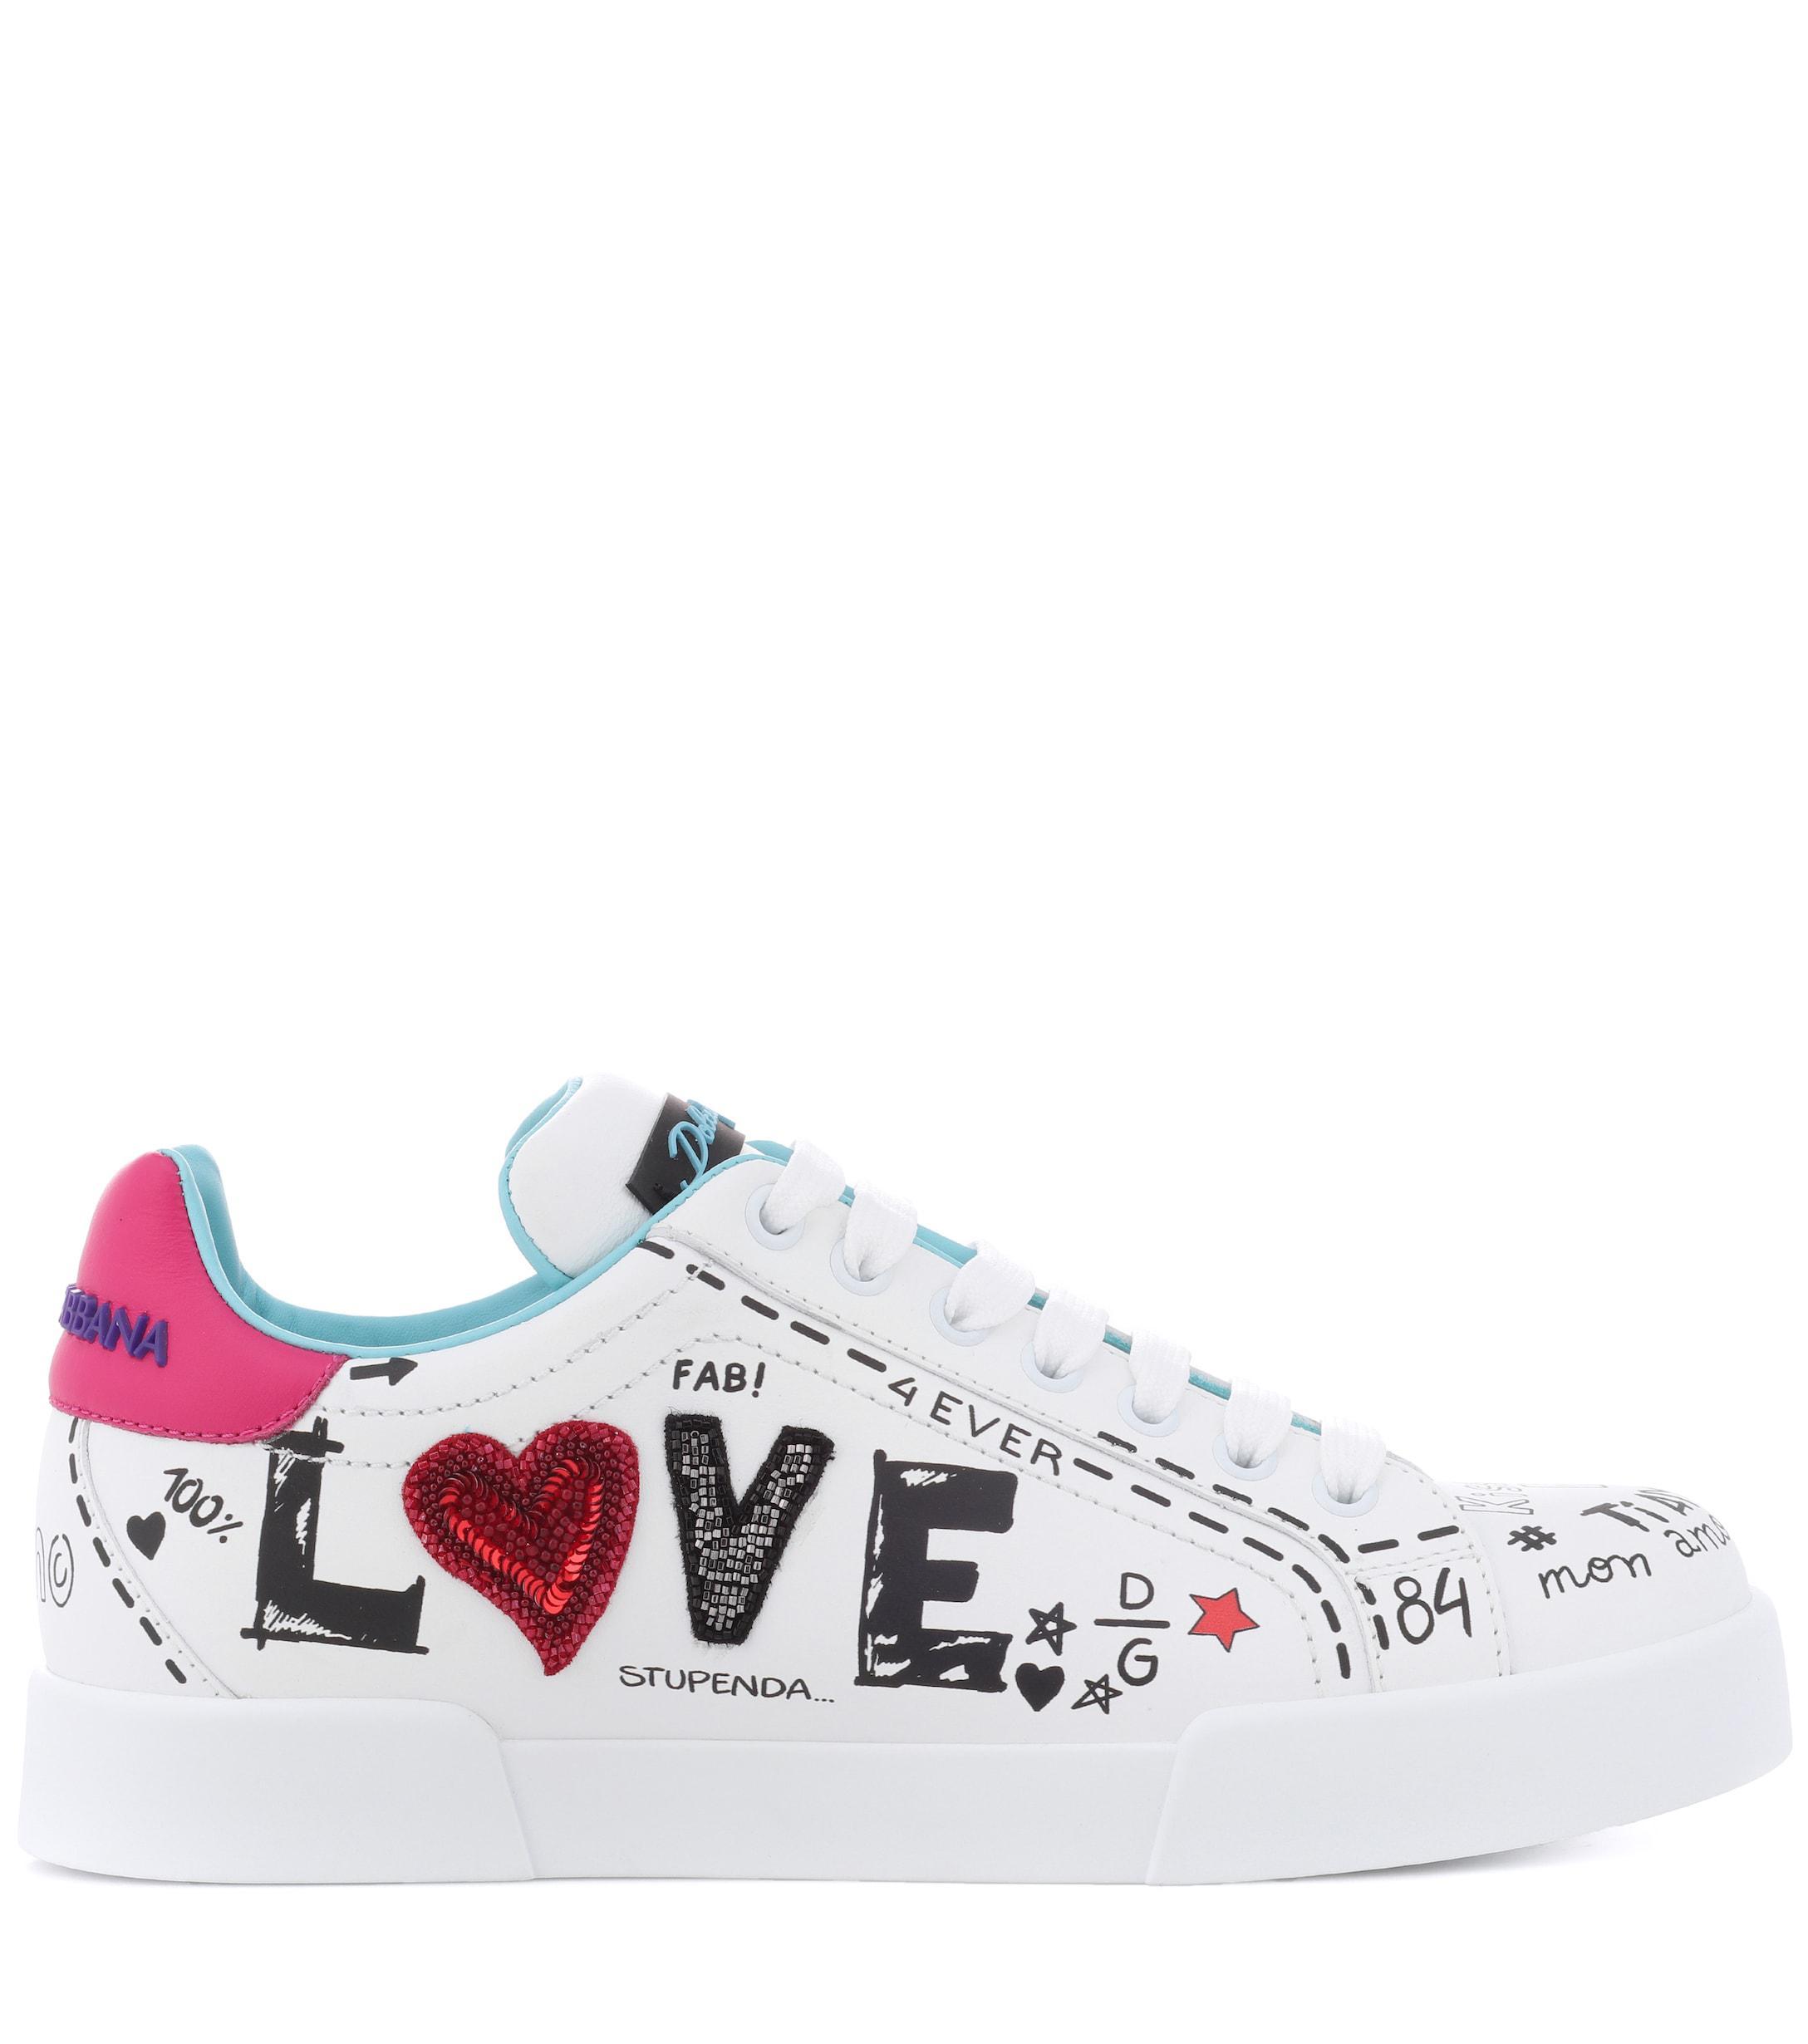 Women's White Portofino Leather Sneakers